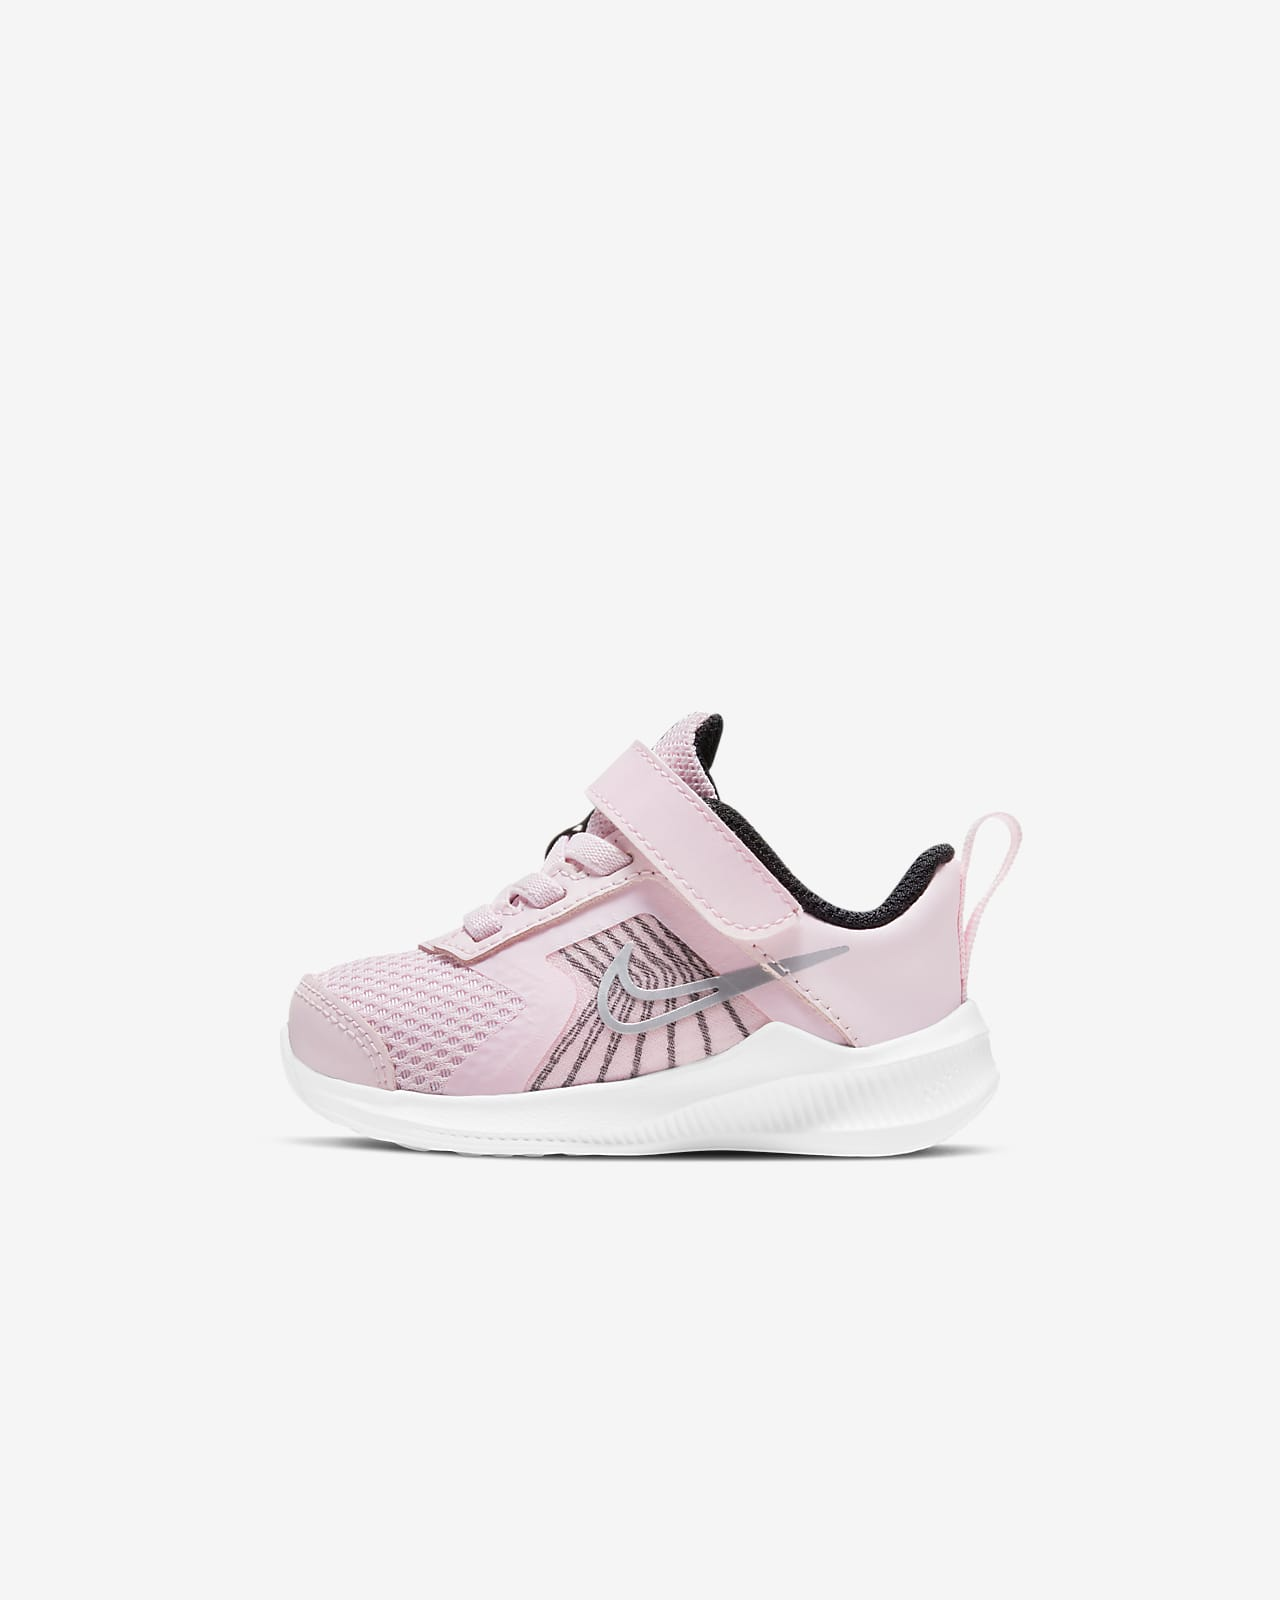 Nike Downshifter 11 Baby/Toddler Shoe